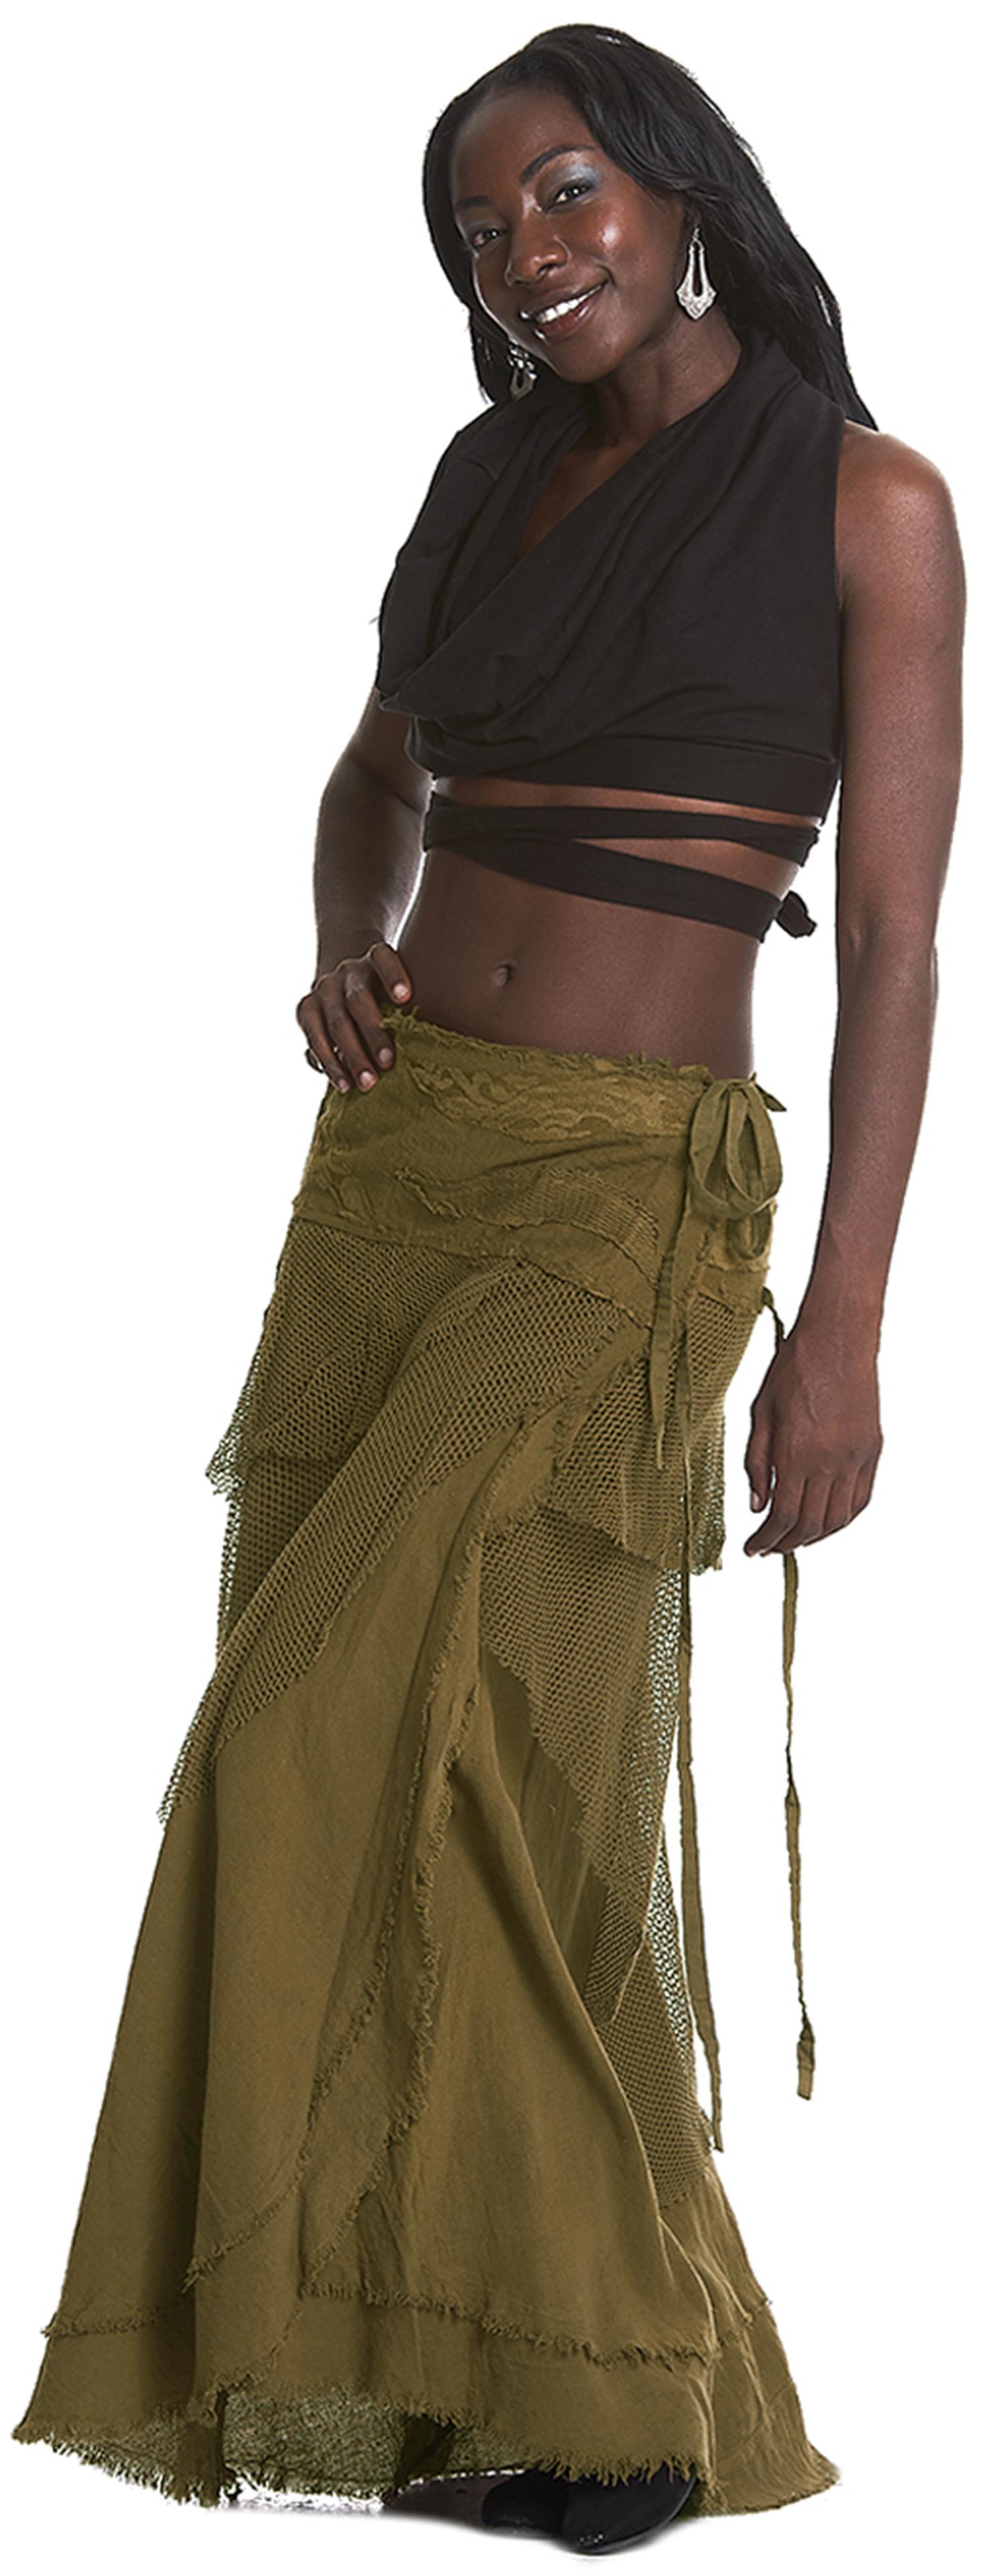 wrap around mermeid skirt